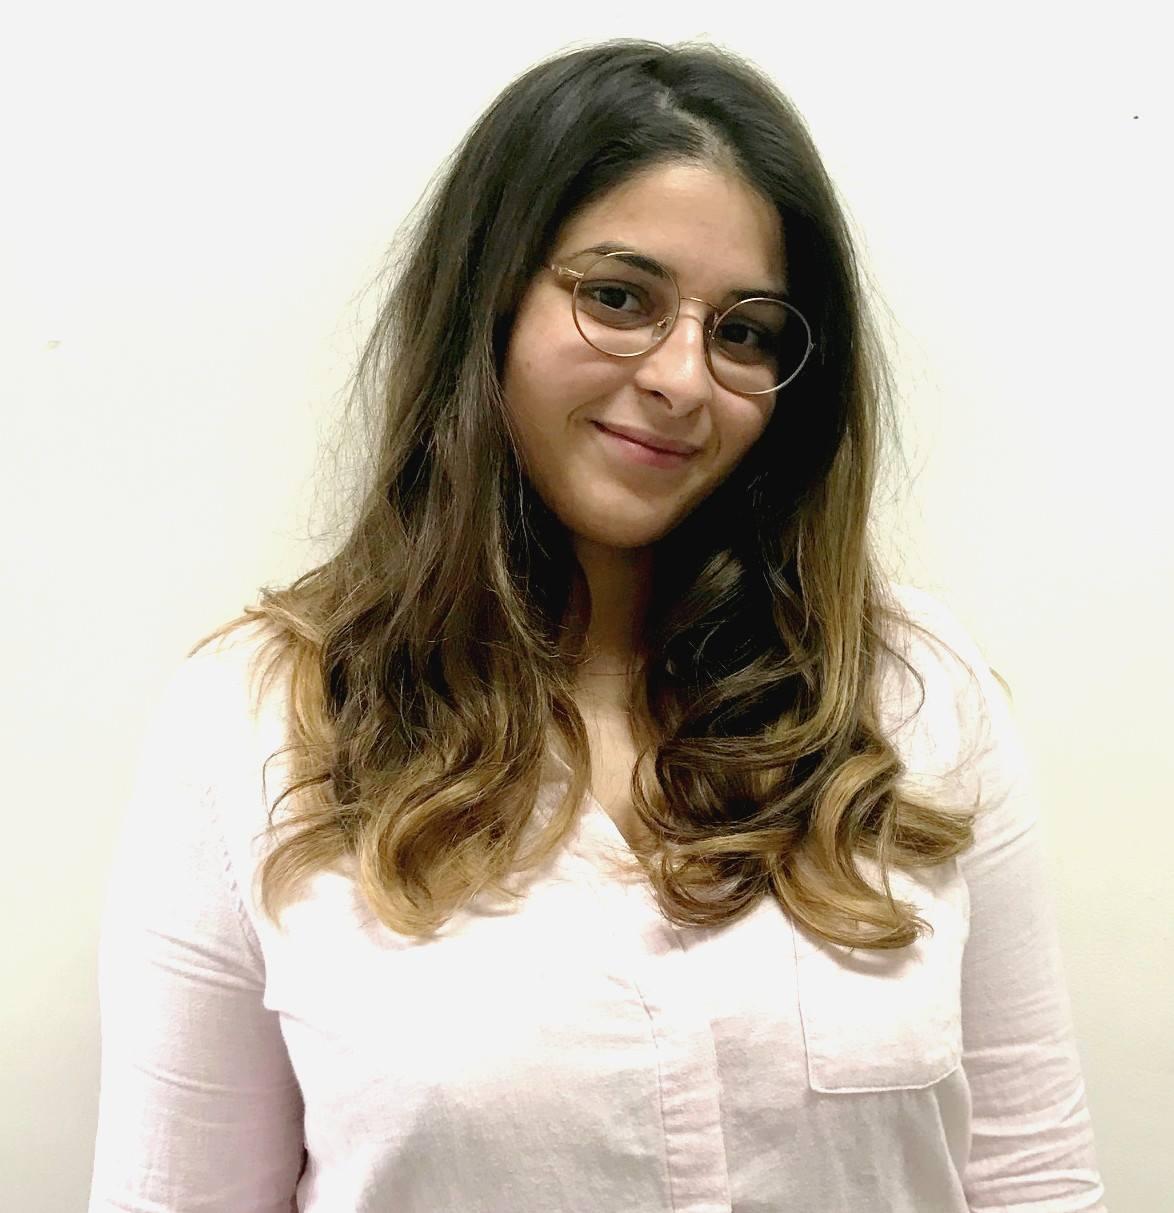 Sabrina Ait El Hadi